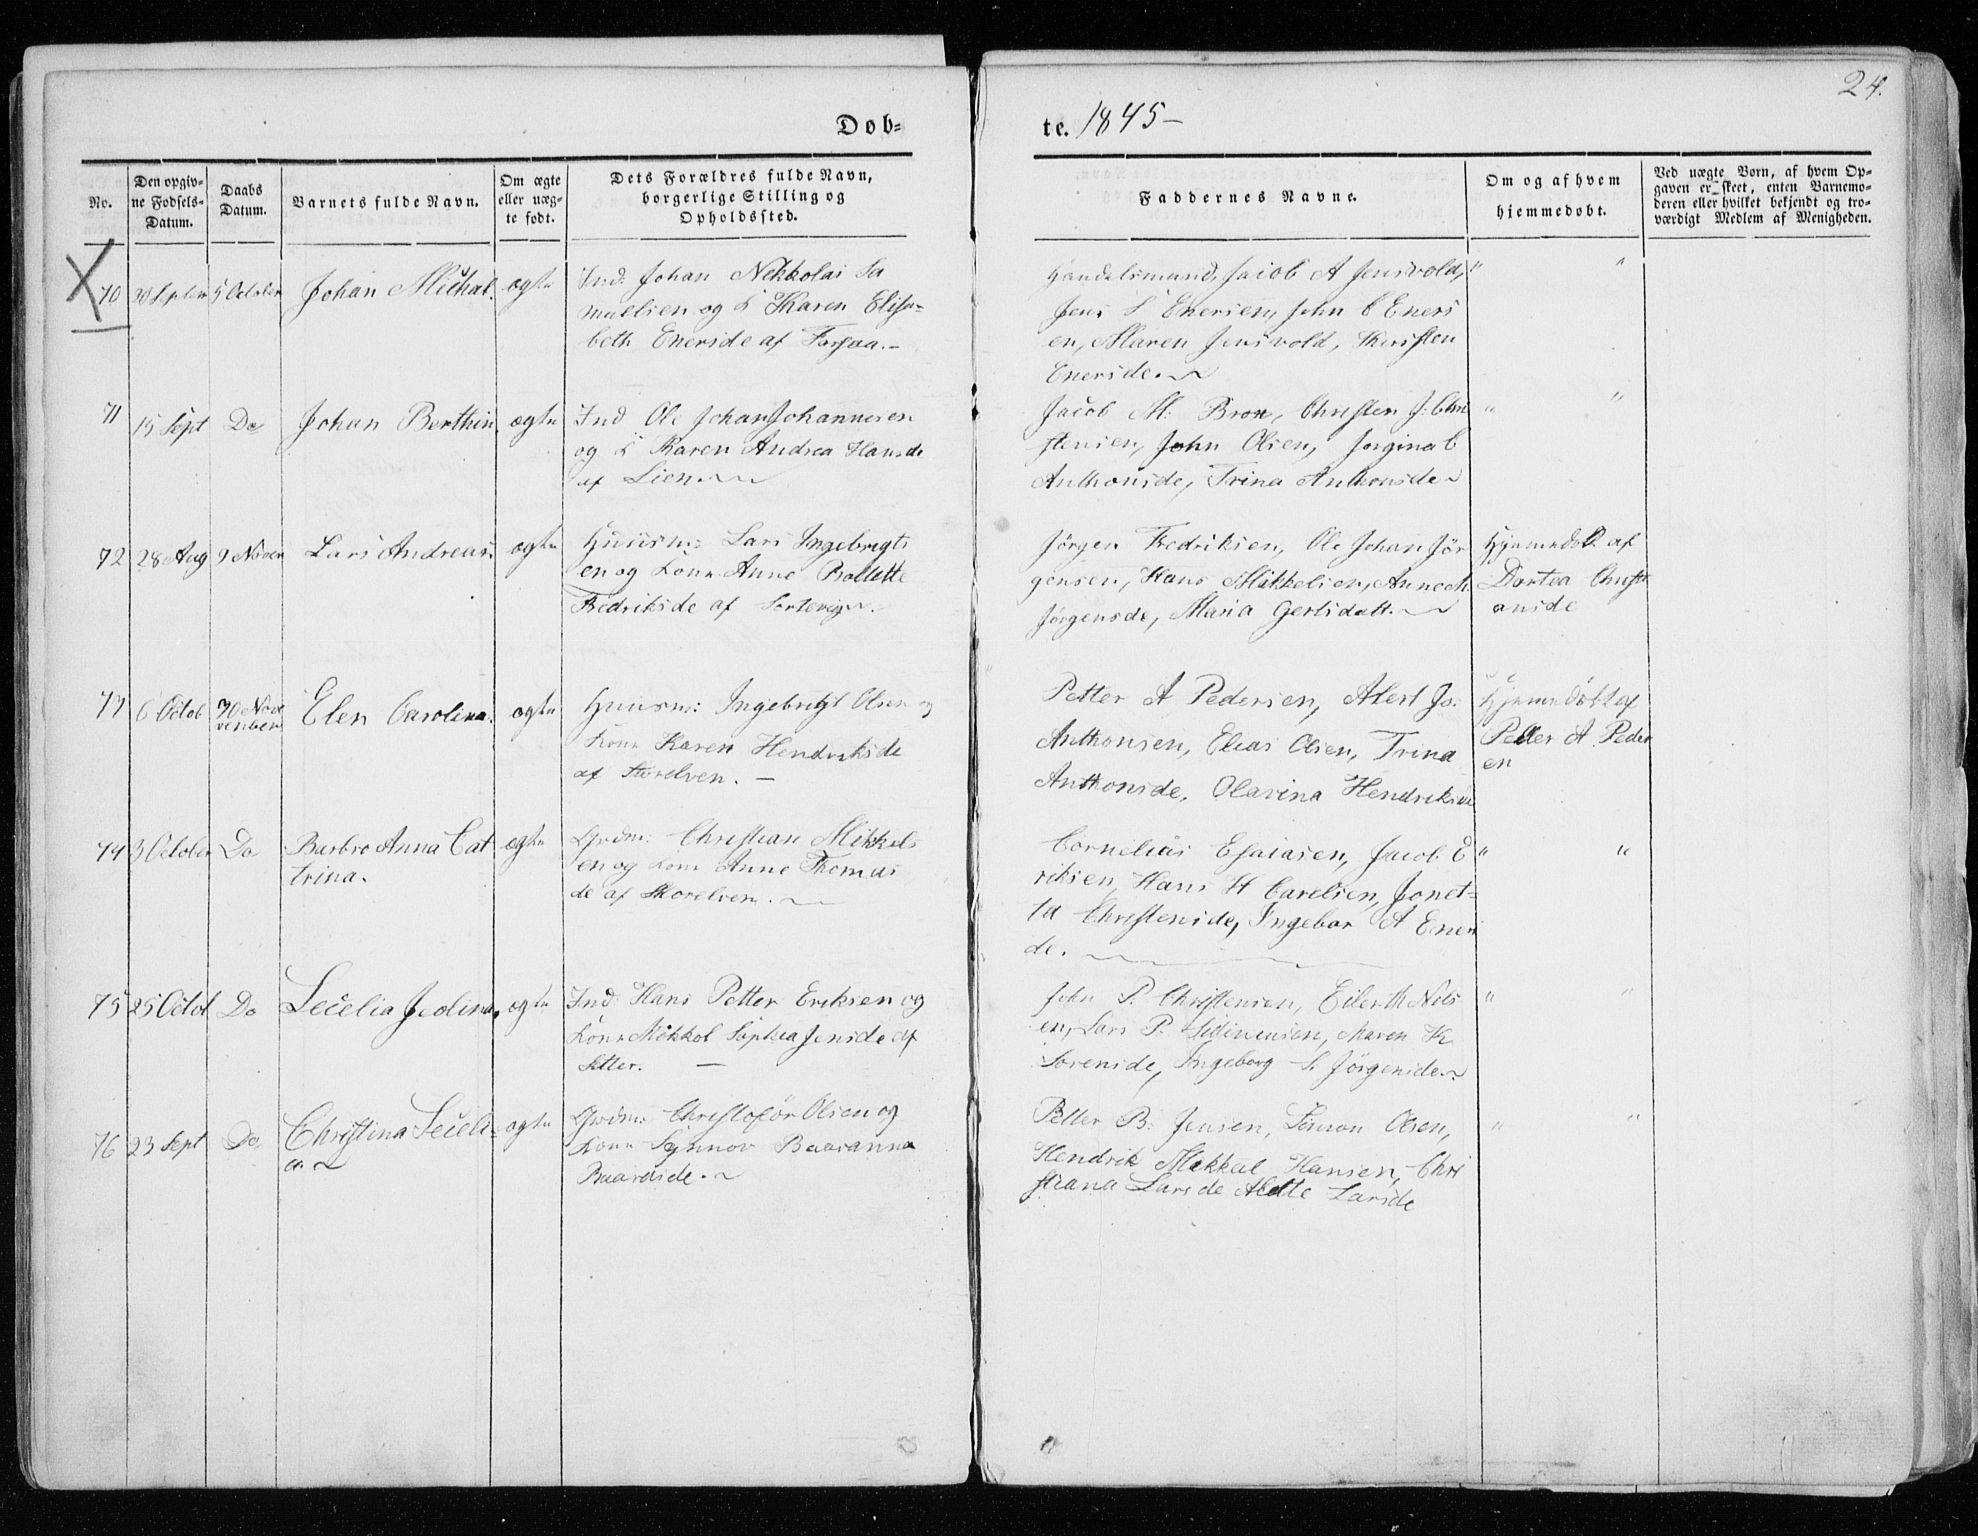 SATØ, Tranøy sokneprestkontor, I/Ia/Iaa/L0006kirke: Ministerialbok nr. 6, 1844-1855, s. 24